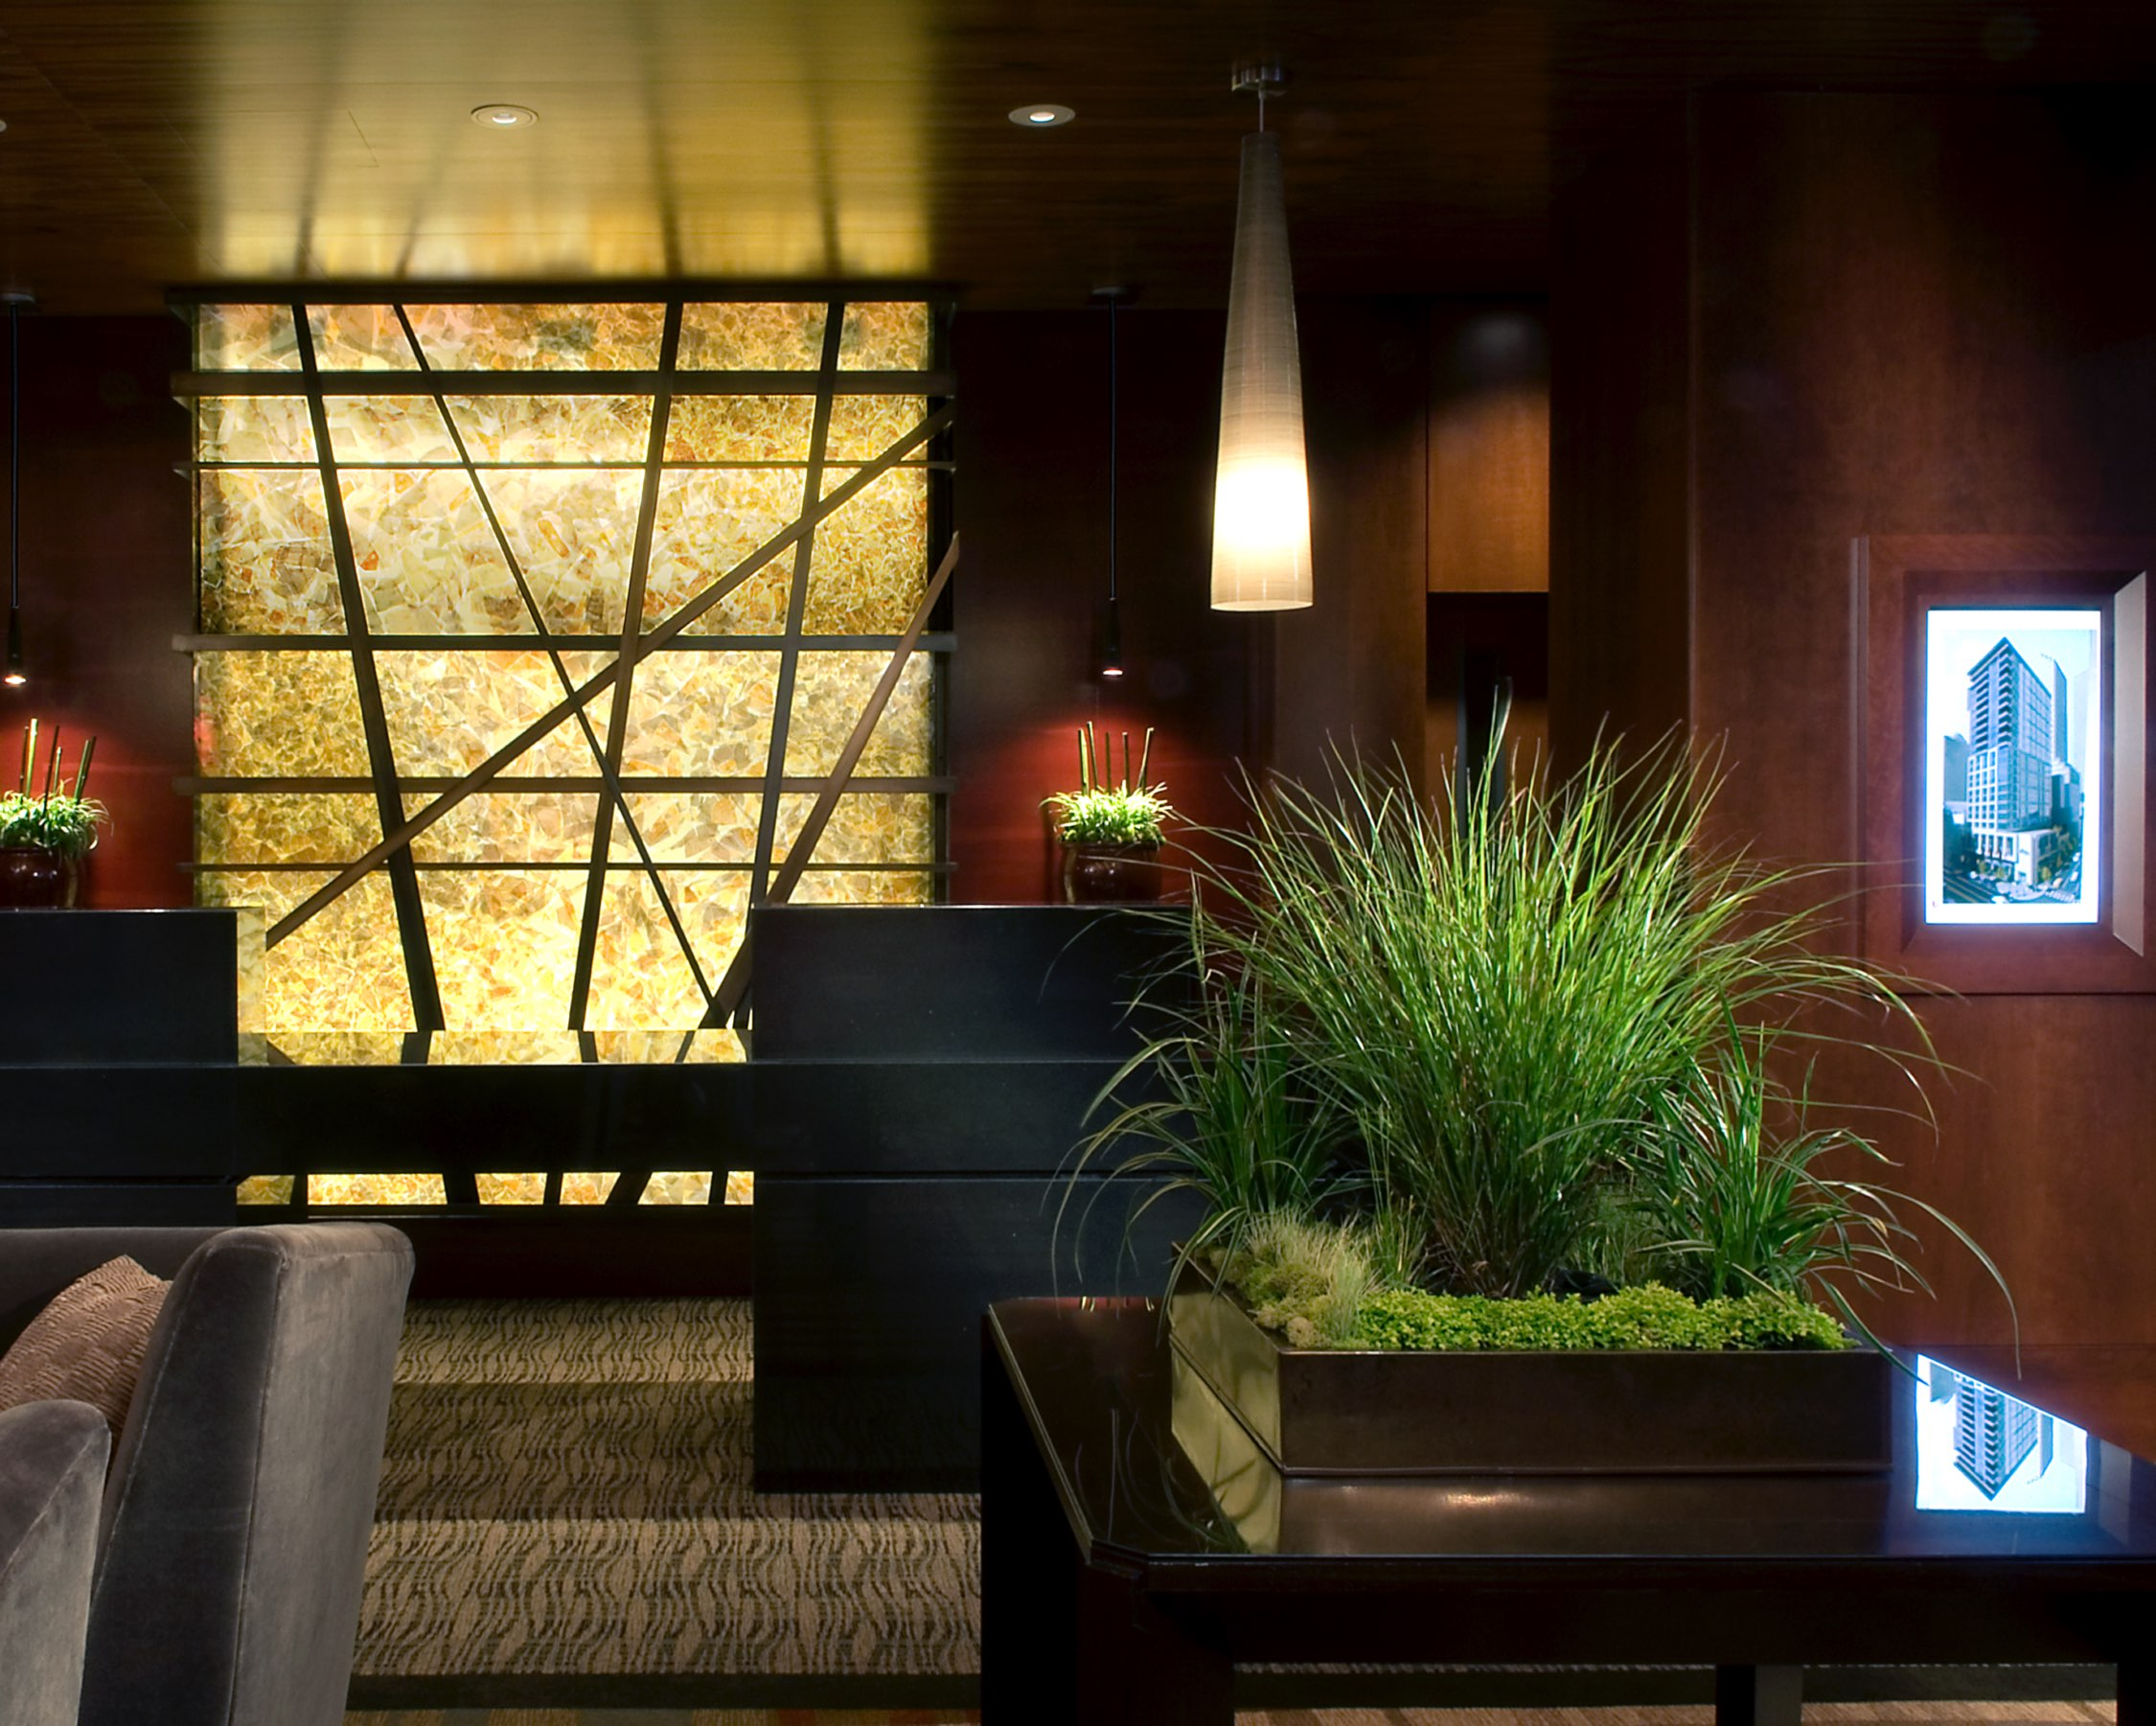 Hotel-1000-Studio-Lux-Lighting-3